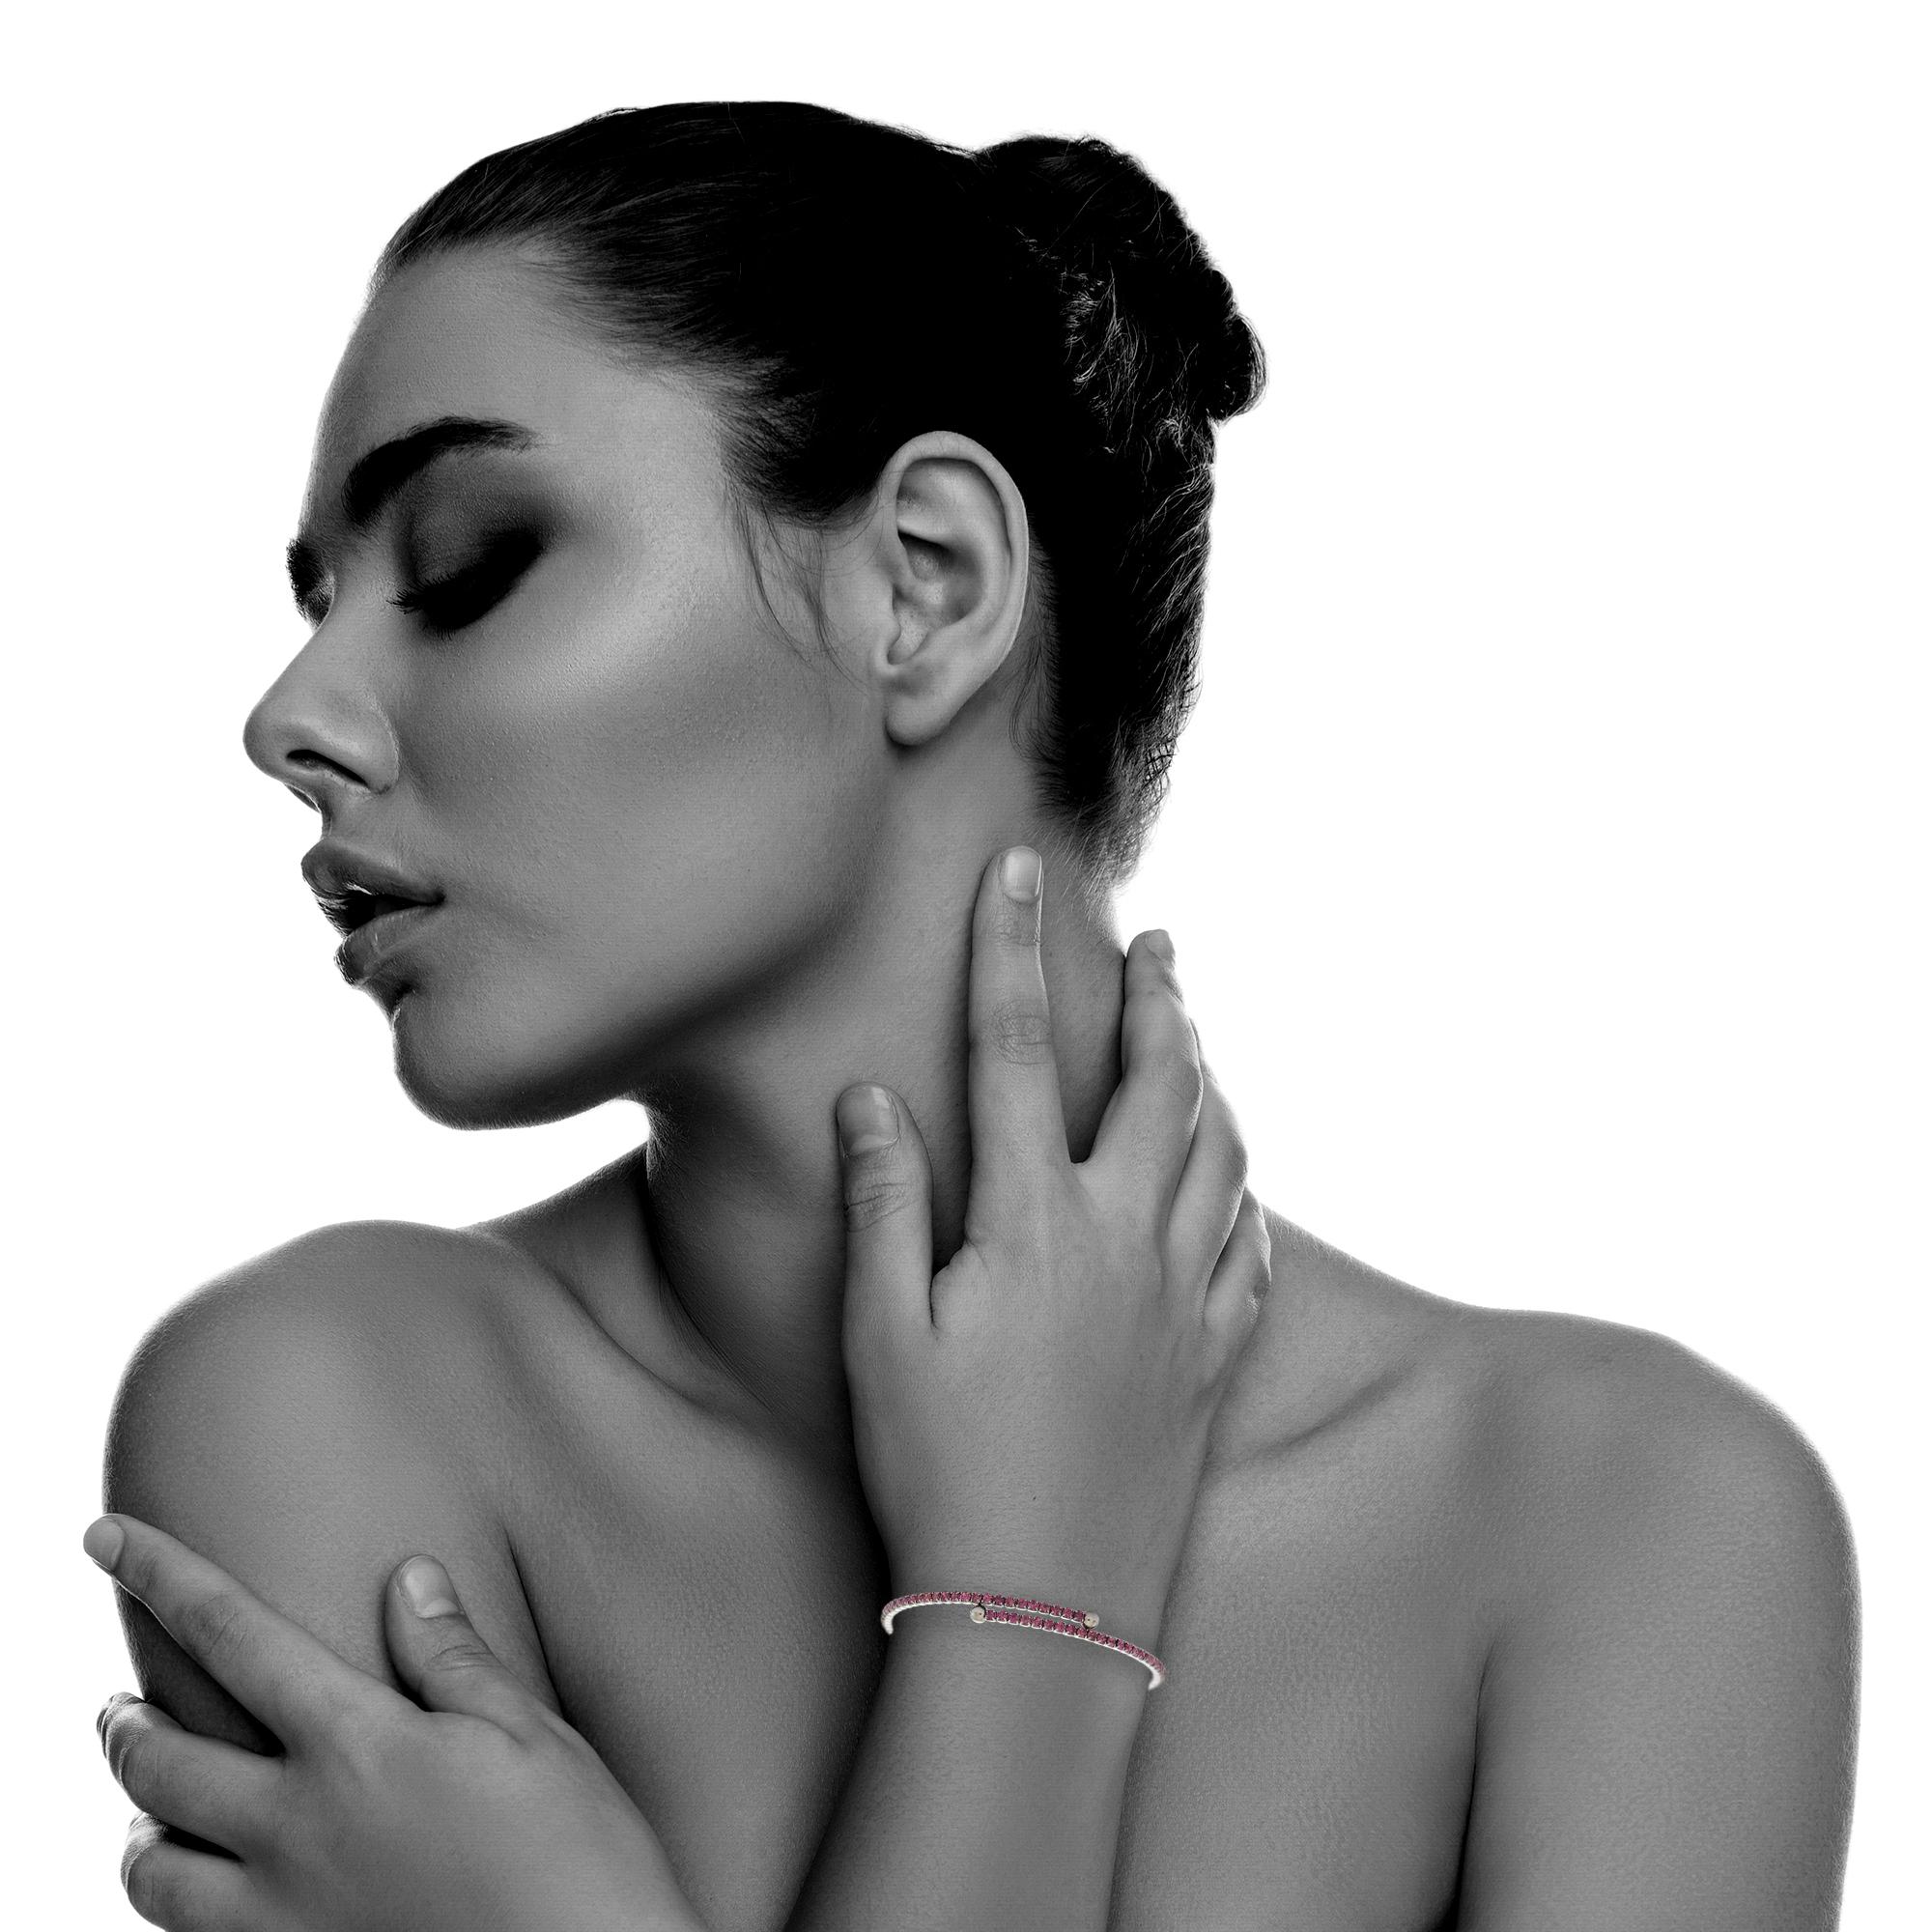 Womens-Ladies-Fashion-Accessories-Jewelry-Black-Rhodium-Plated-Bangle-Bracelet thumbnail 8